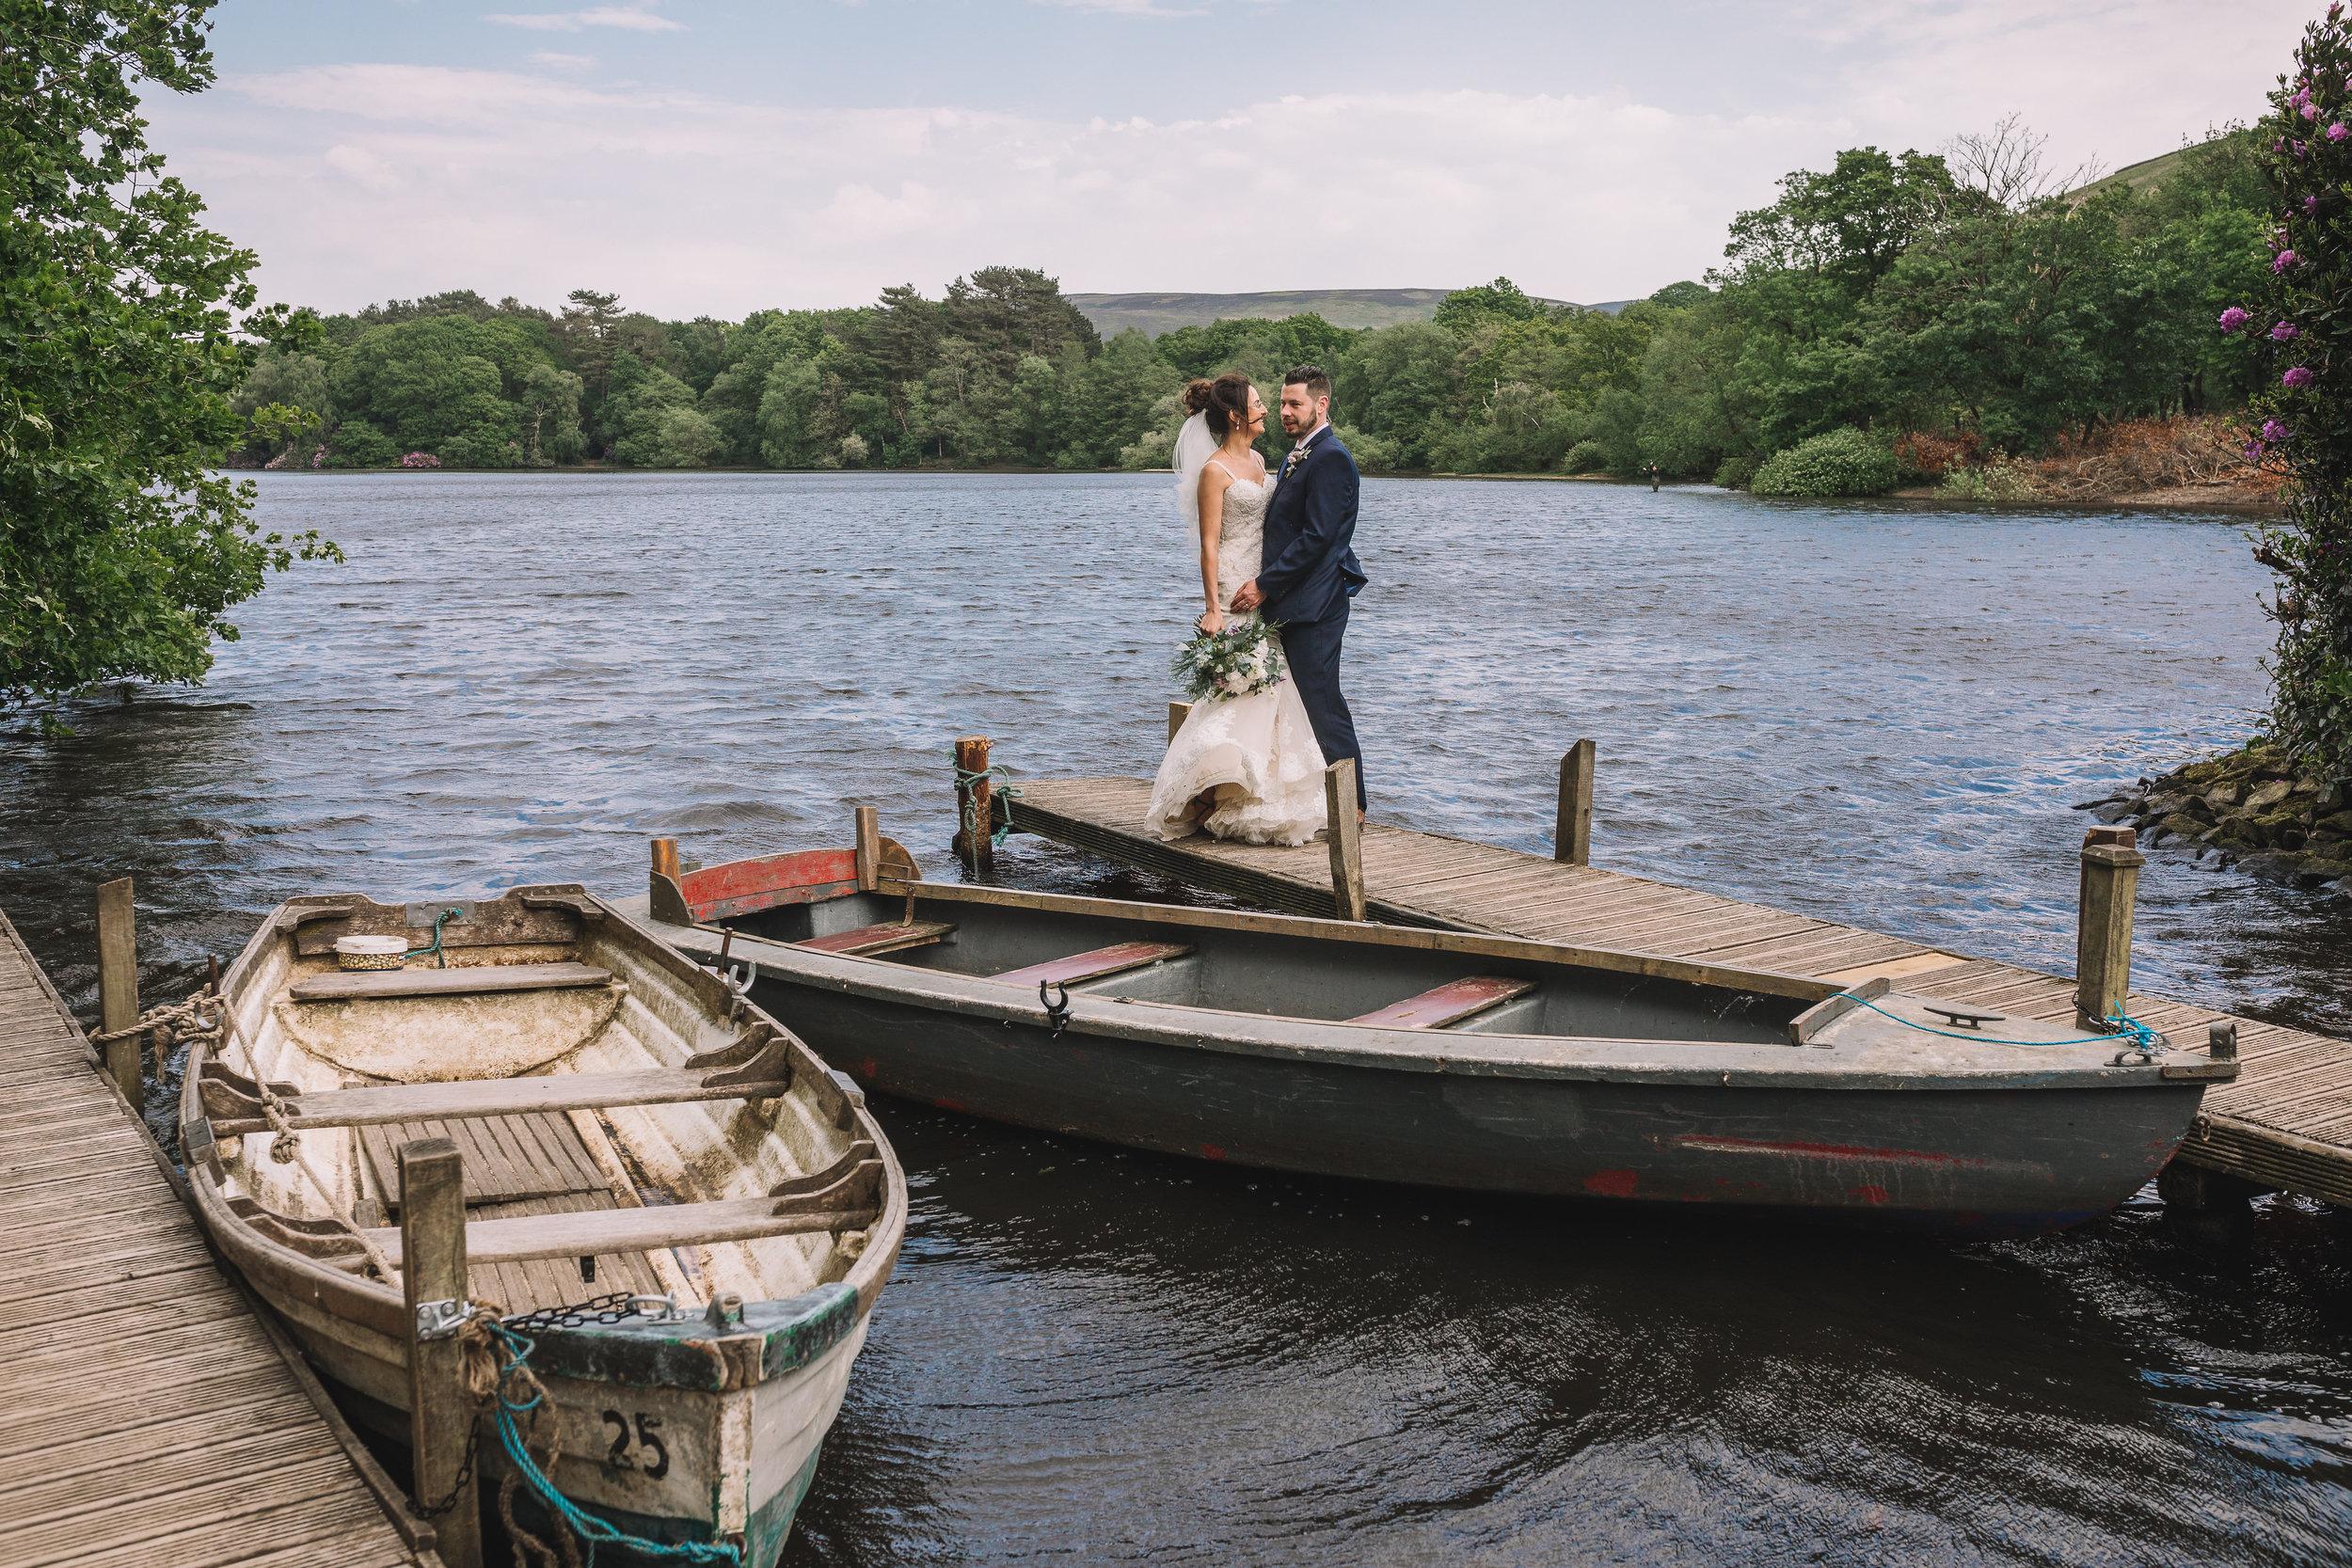 Boating lake wedding kiss